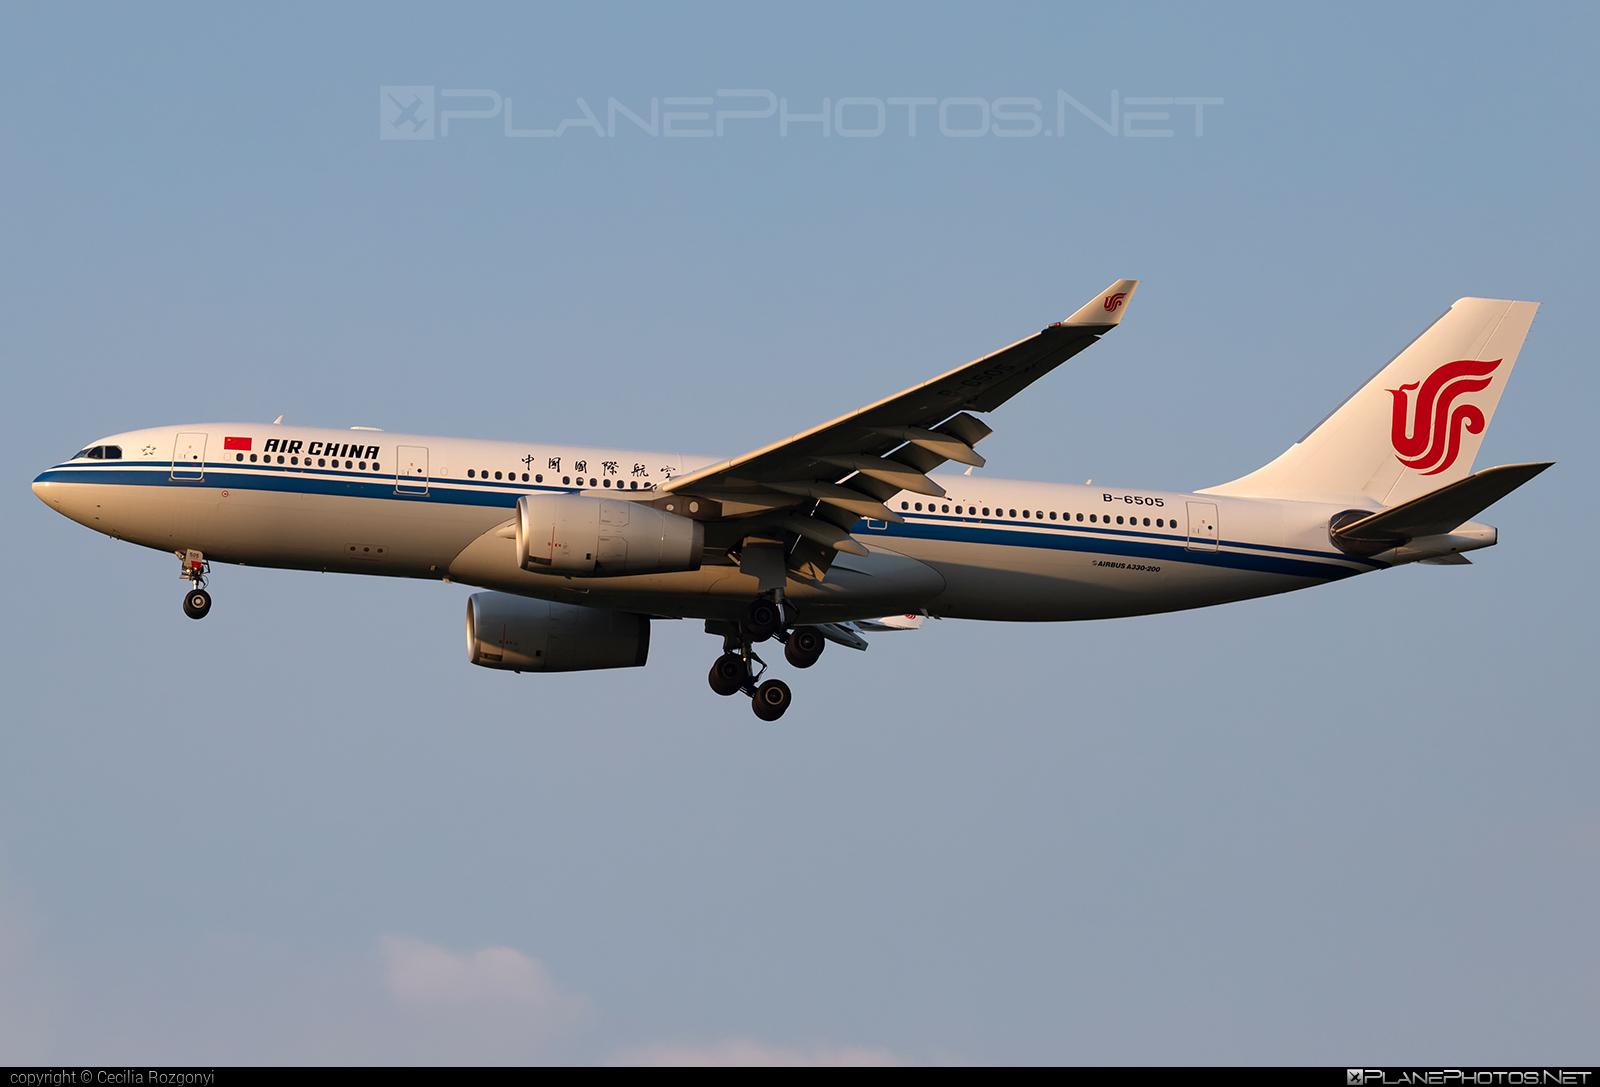 Airbus A330-243 - B-6505 operated by Air China #a330 #a330family #airbus #airbus330 #airchina